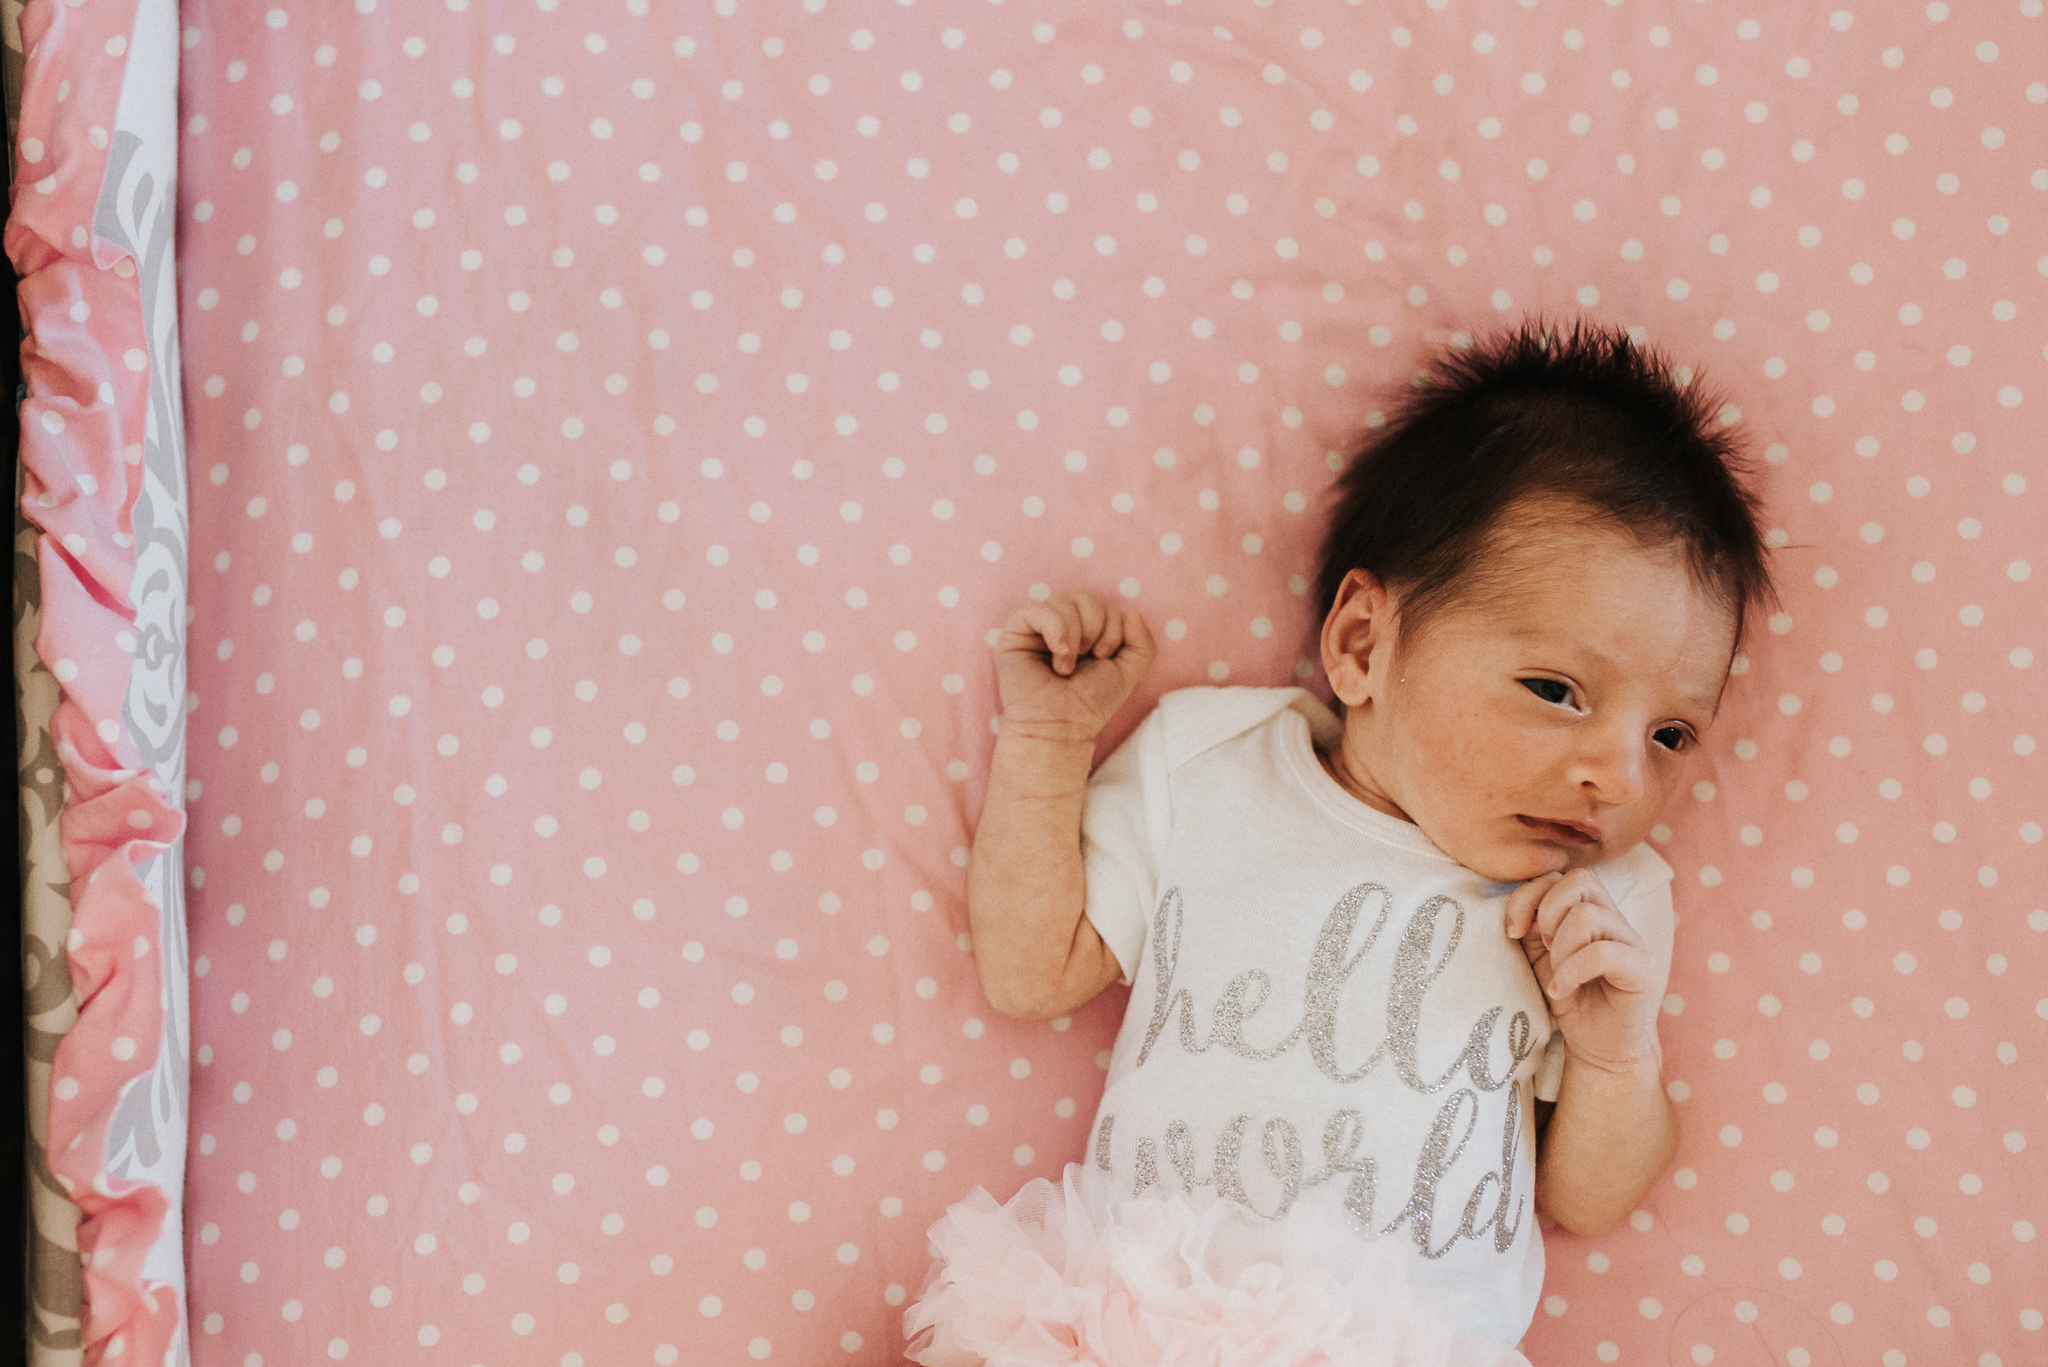 Newborn Photographer_Round Rock Newborn Photographer_Pflugerville Newborn Photographer_Austin Newborn Photographer_Newborn Photography-3.jpg